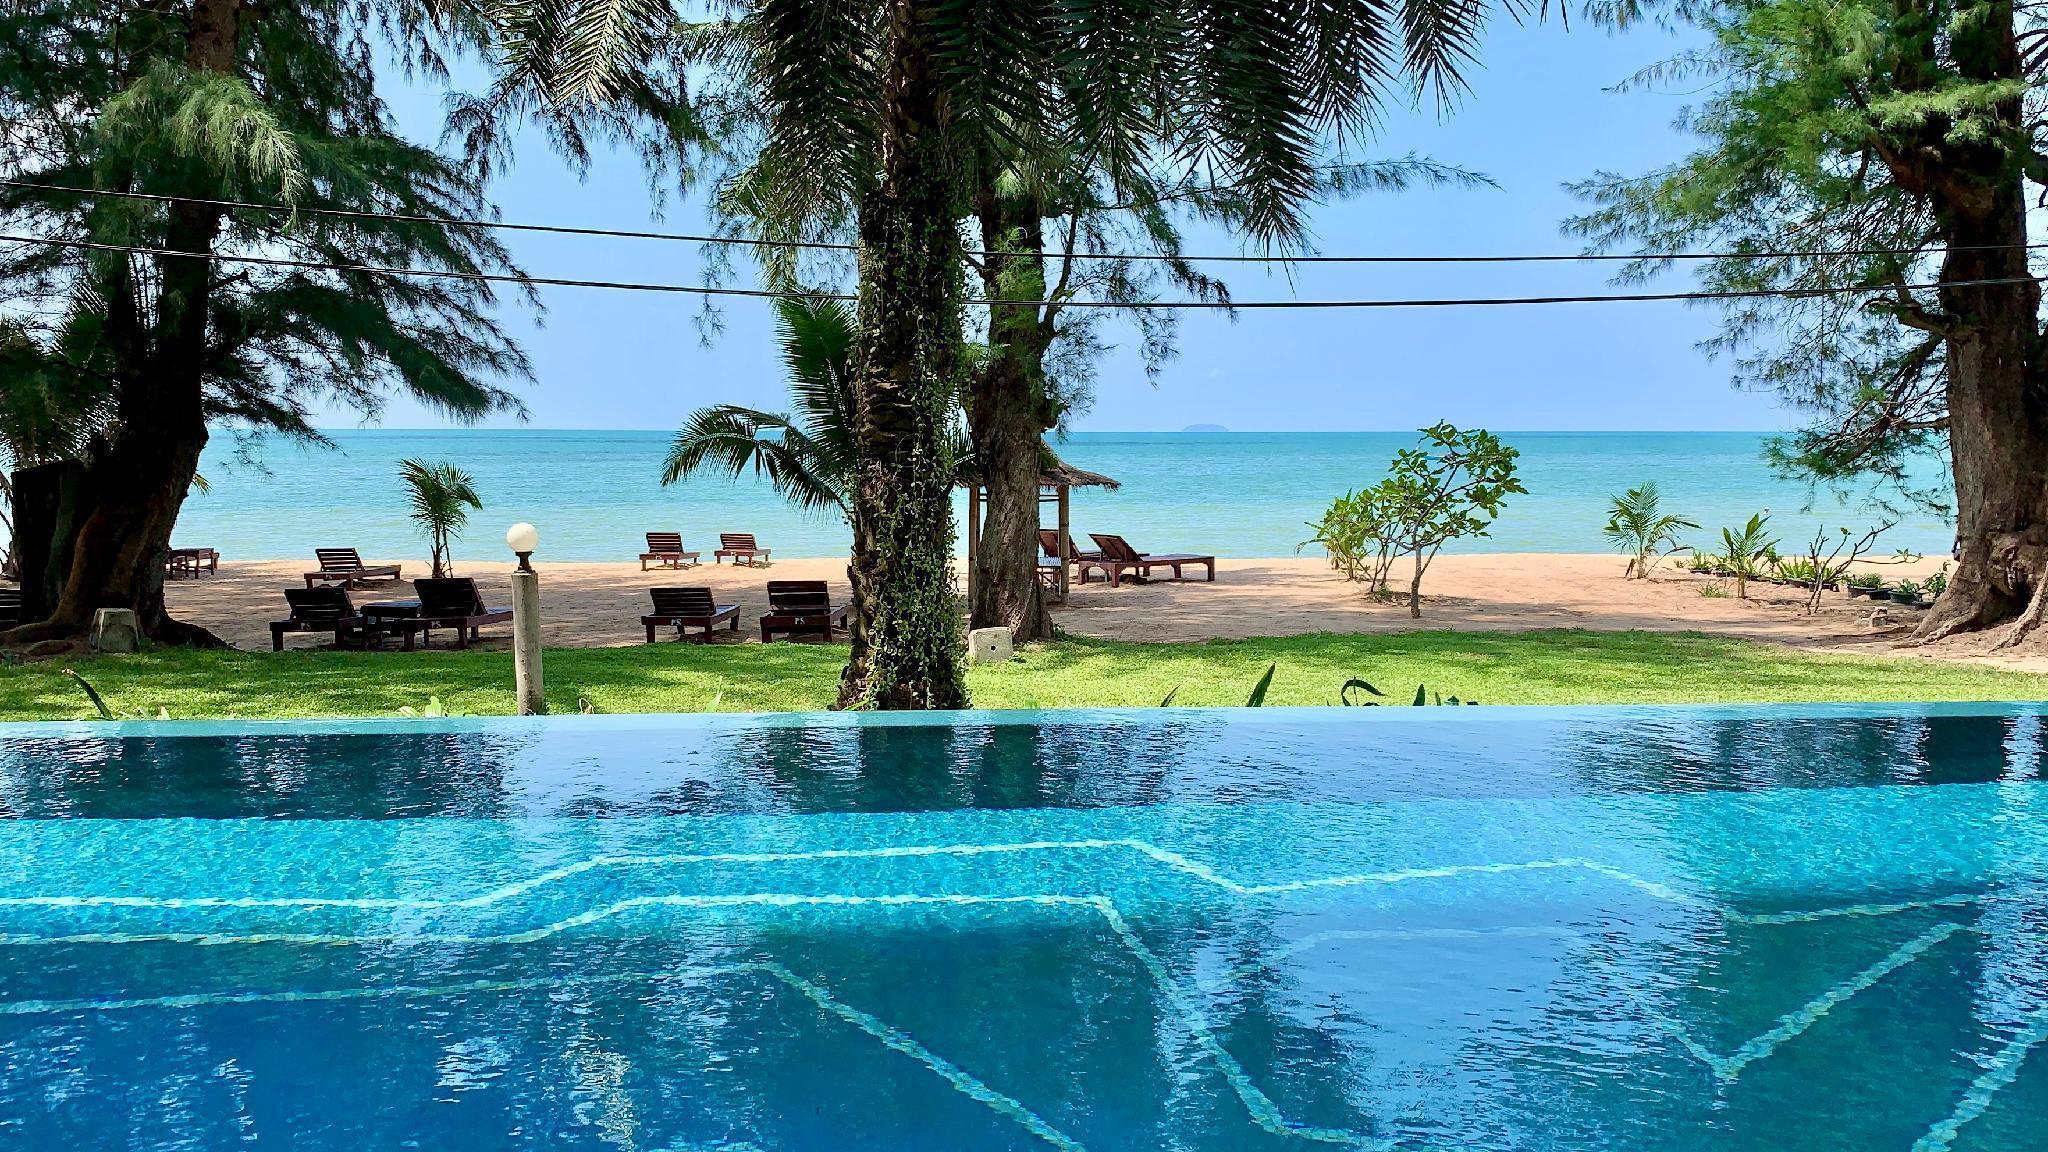 Pattaya Beach Front Delux Suite &Private Beach อพาร์ตเมนต์ 1 ห้องนอน 2 ห้องน้ำส่วนตัว ขนาด 190 ตร.ม. – นาจอมเทียน